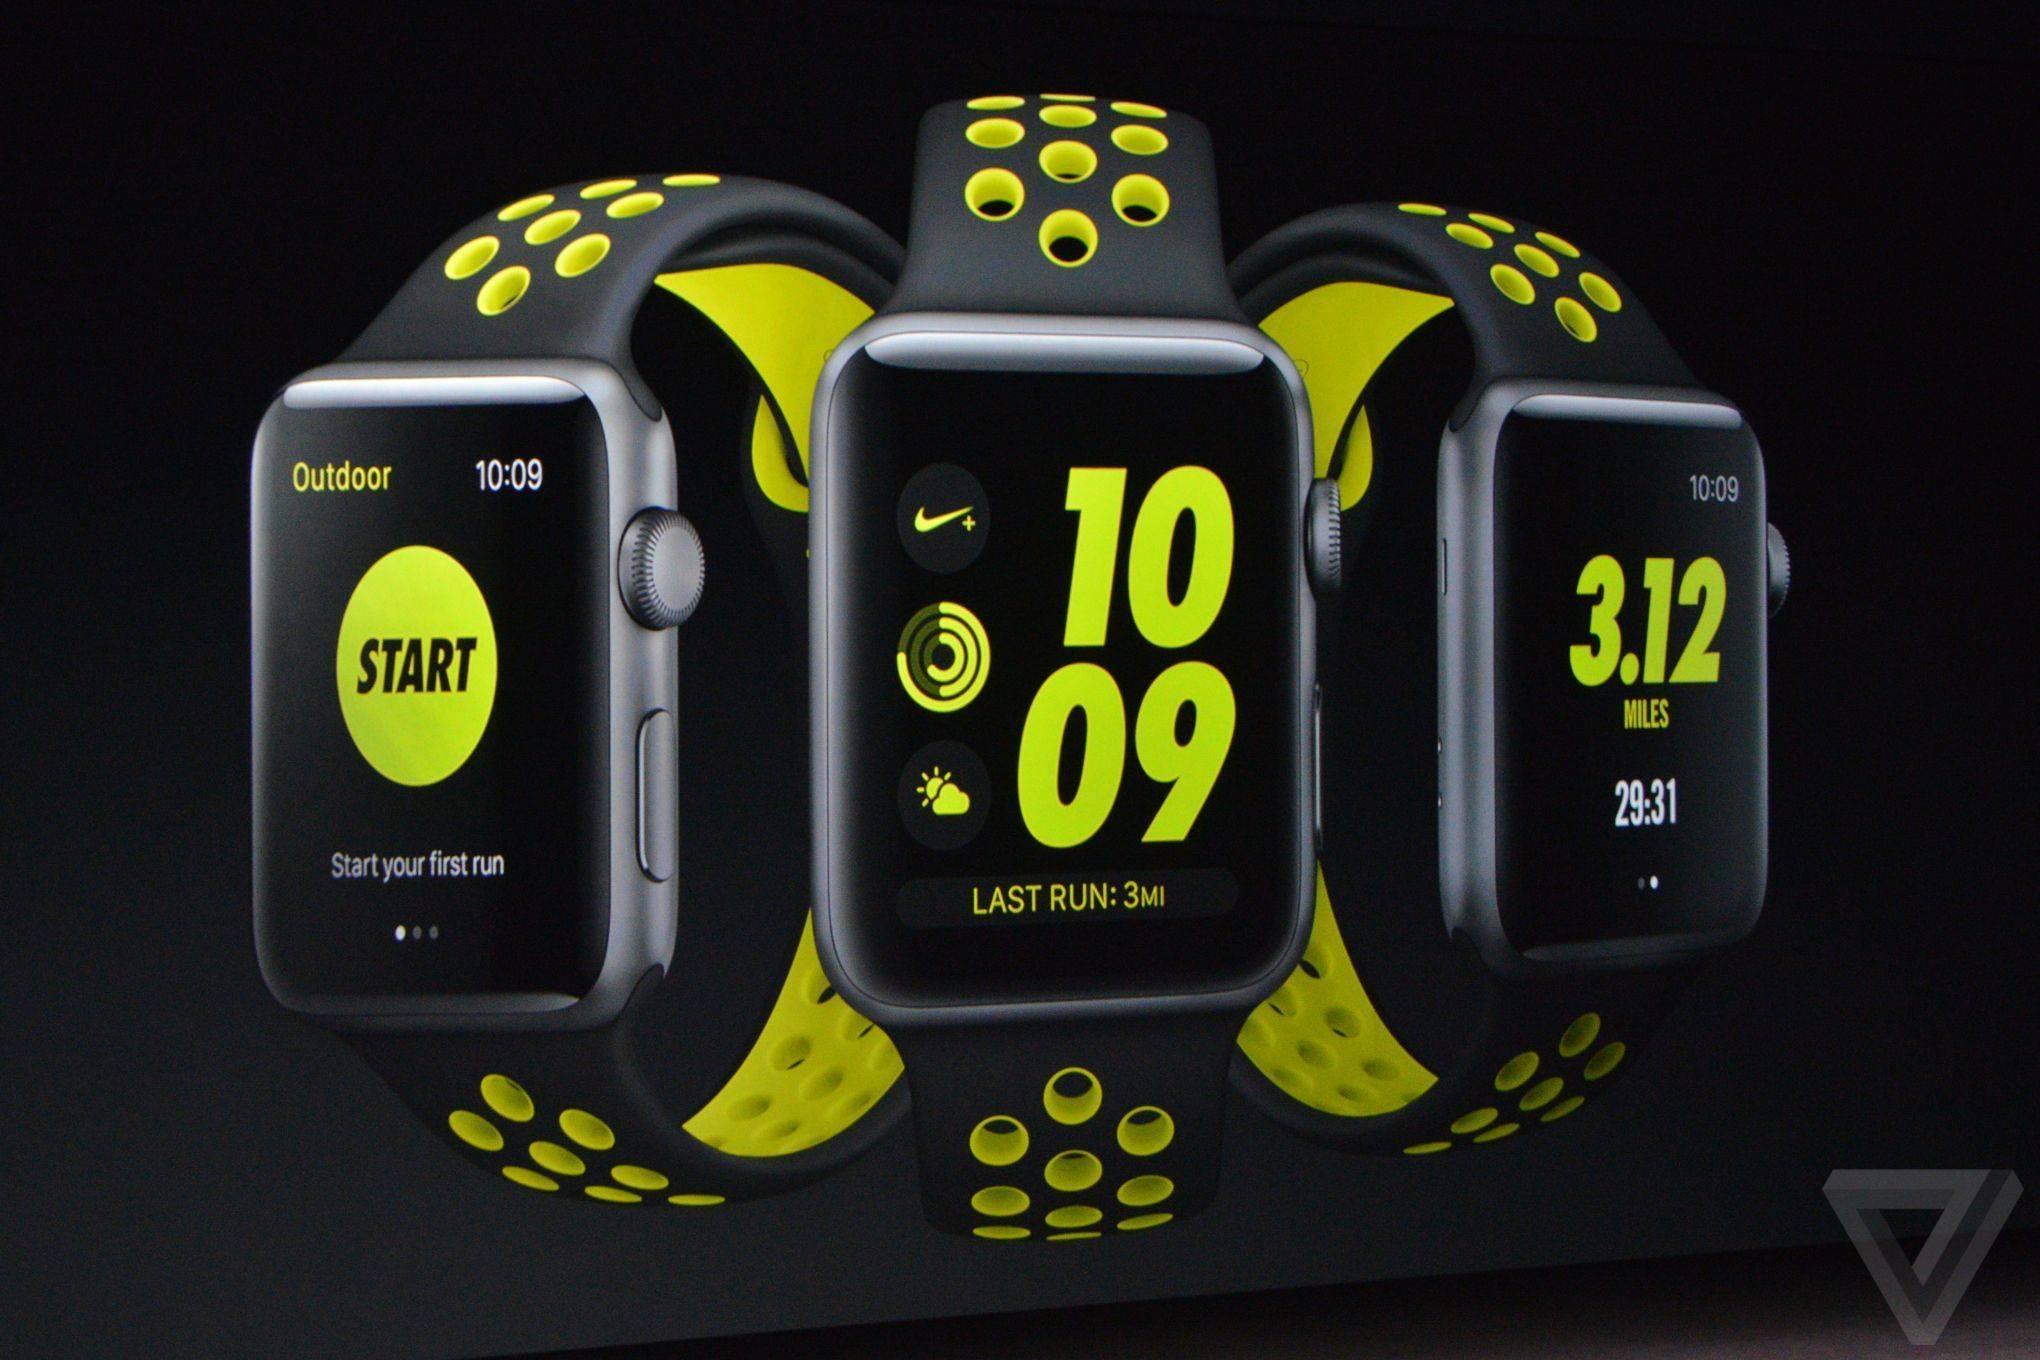 apple-iphone-watch-20160907-4400.JPG